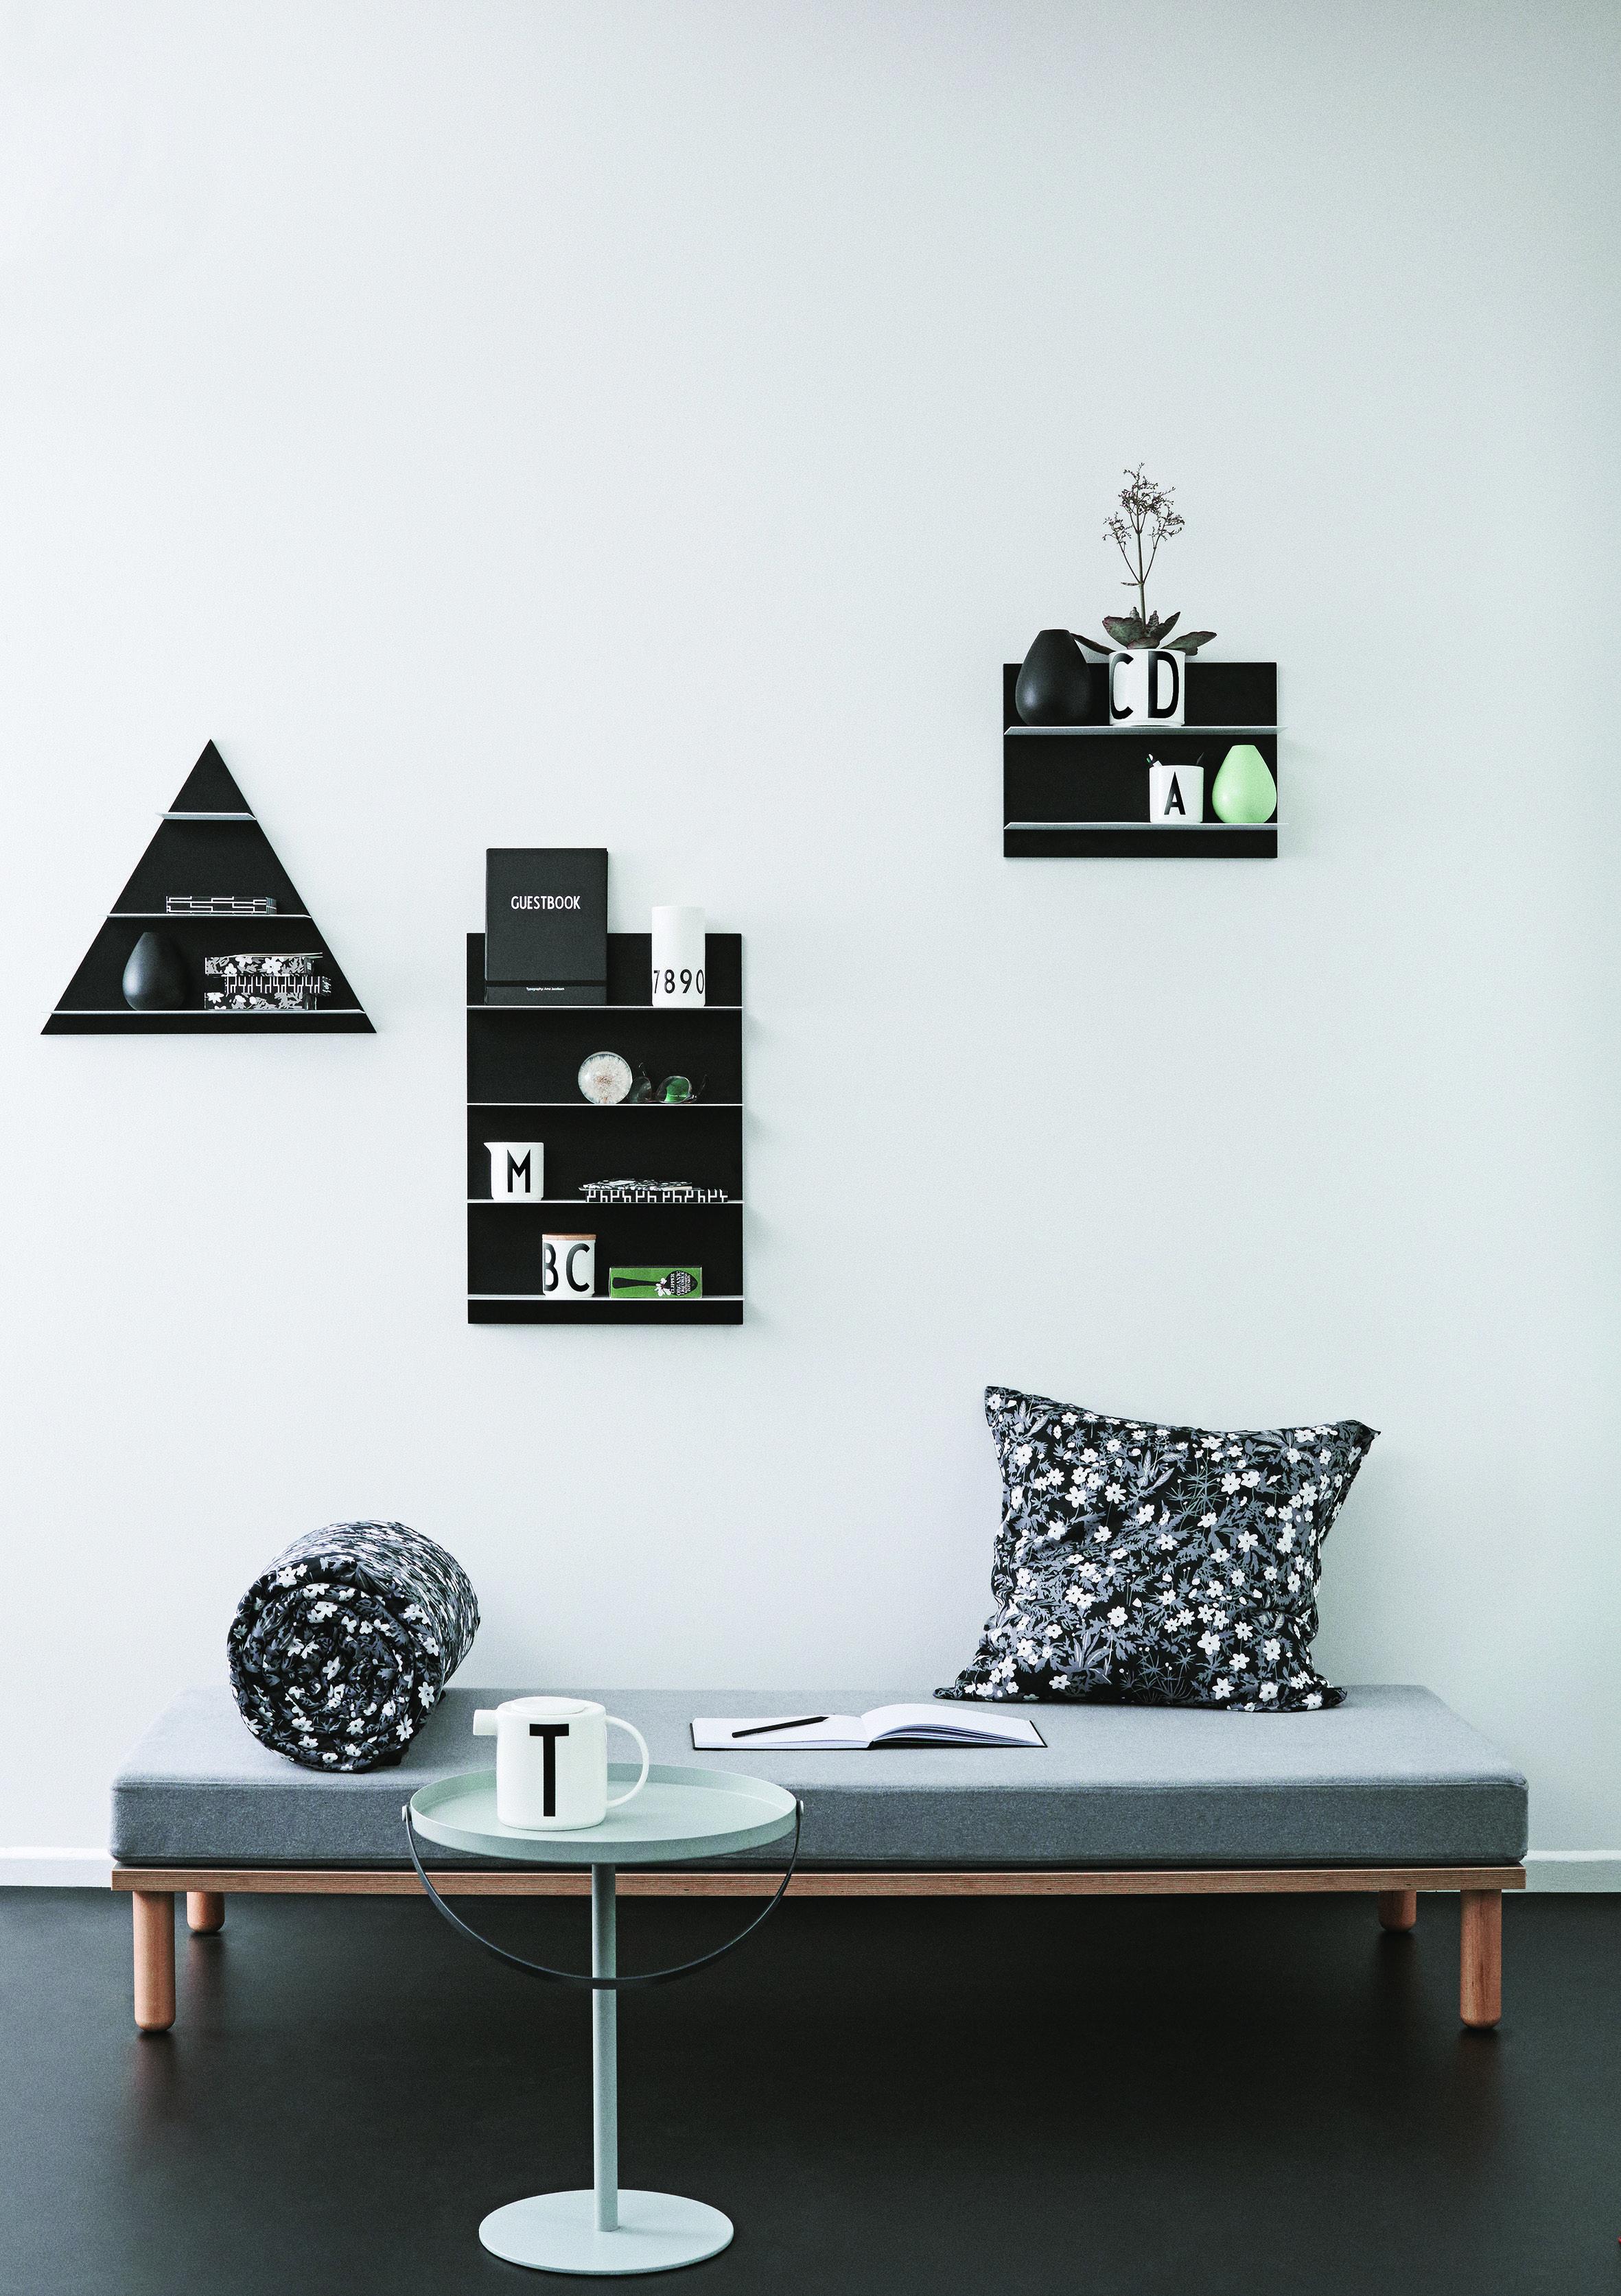 etag re murale paper l 42 x h 59 cm noir design letters made in design. Black Bedroom Furniture Sets. Home Design Ideas